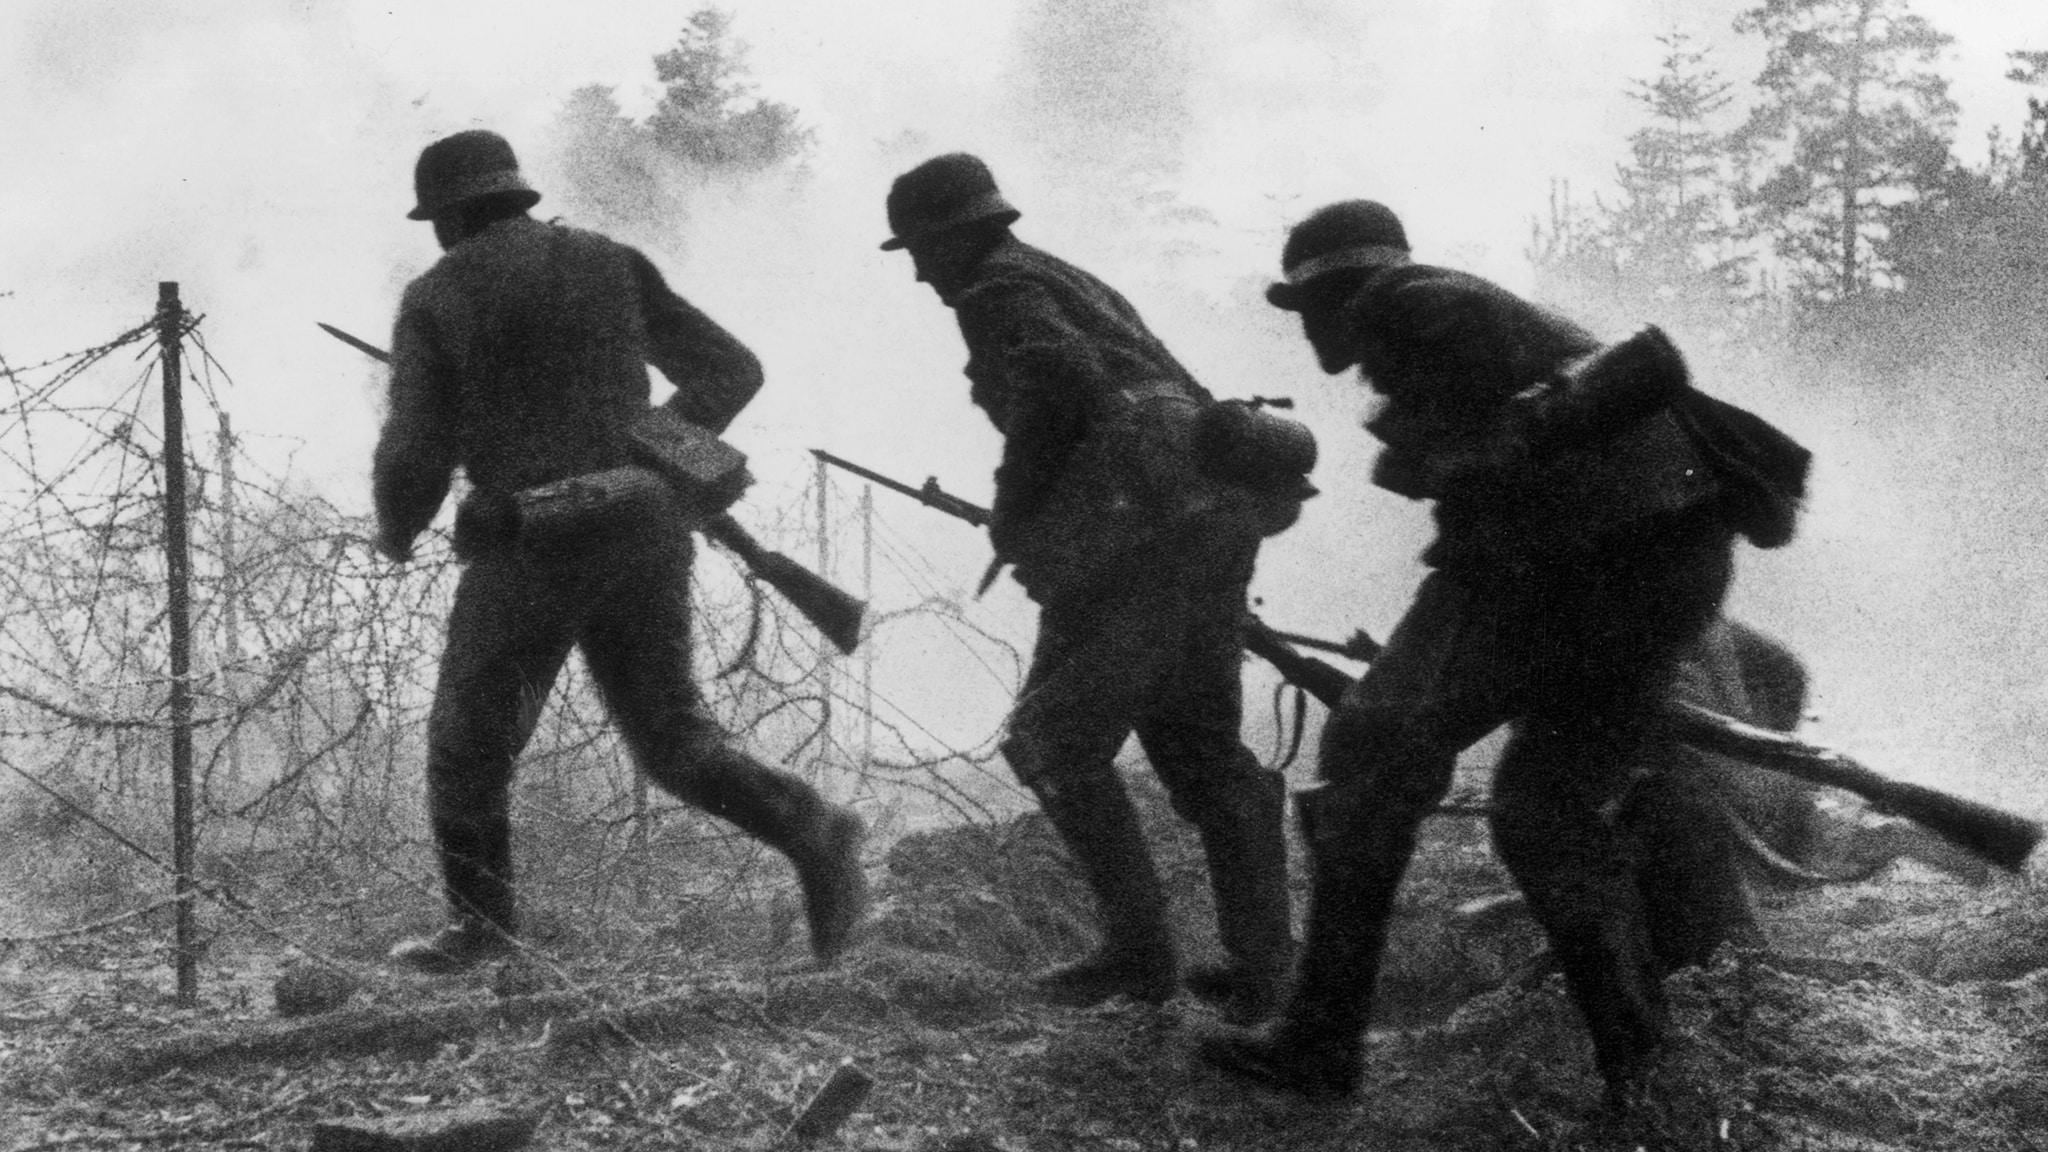 Rai Storia 1939-1945. La II Guerra Mondiale - L'Italia in guerra